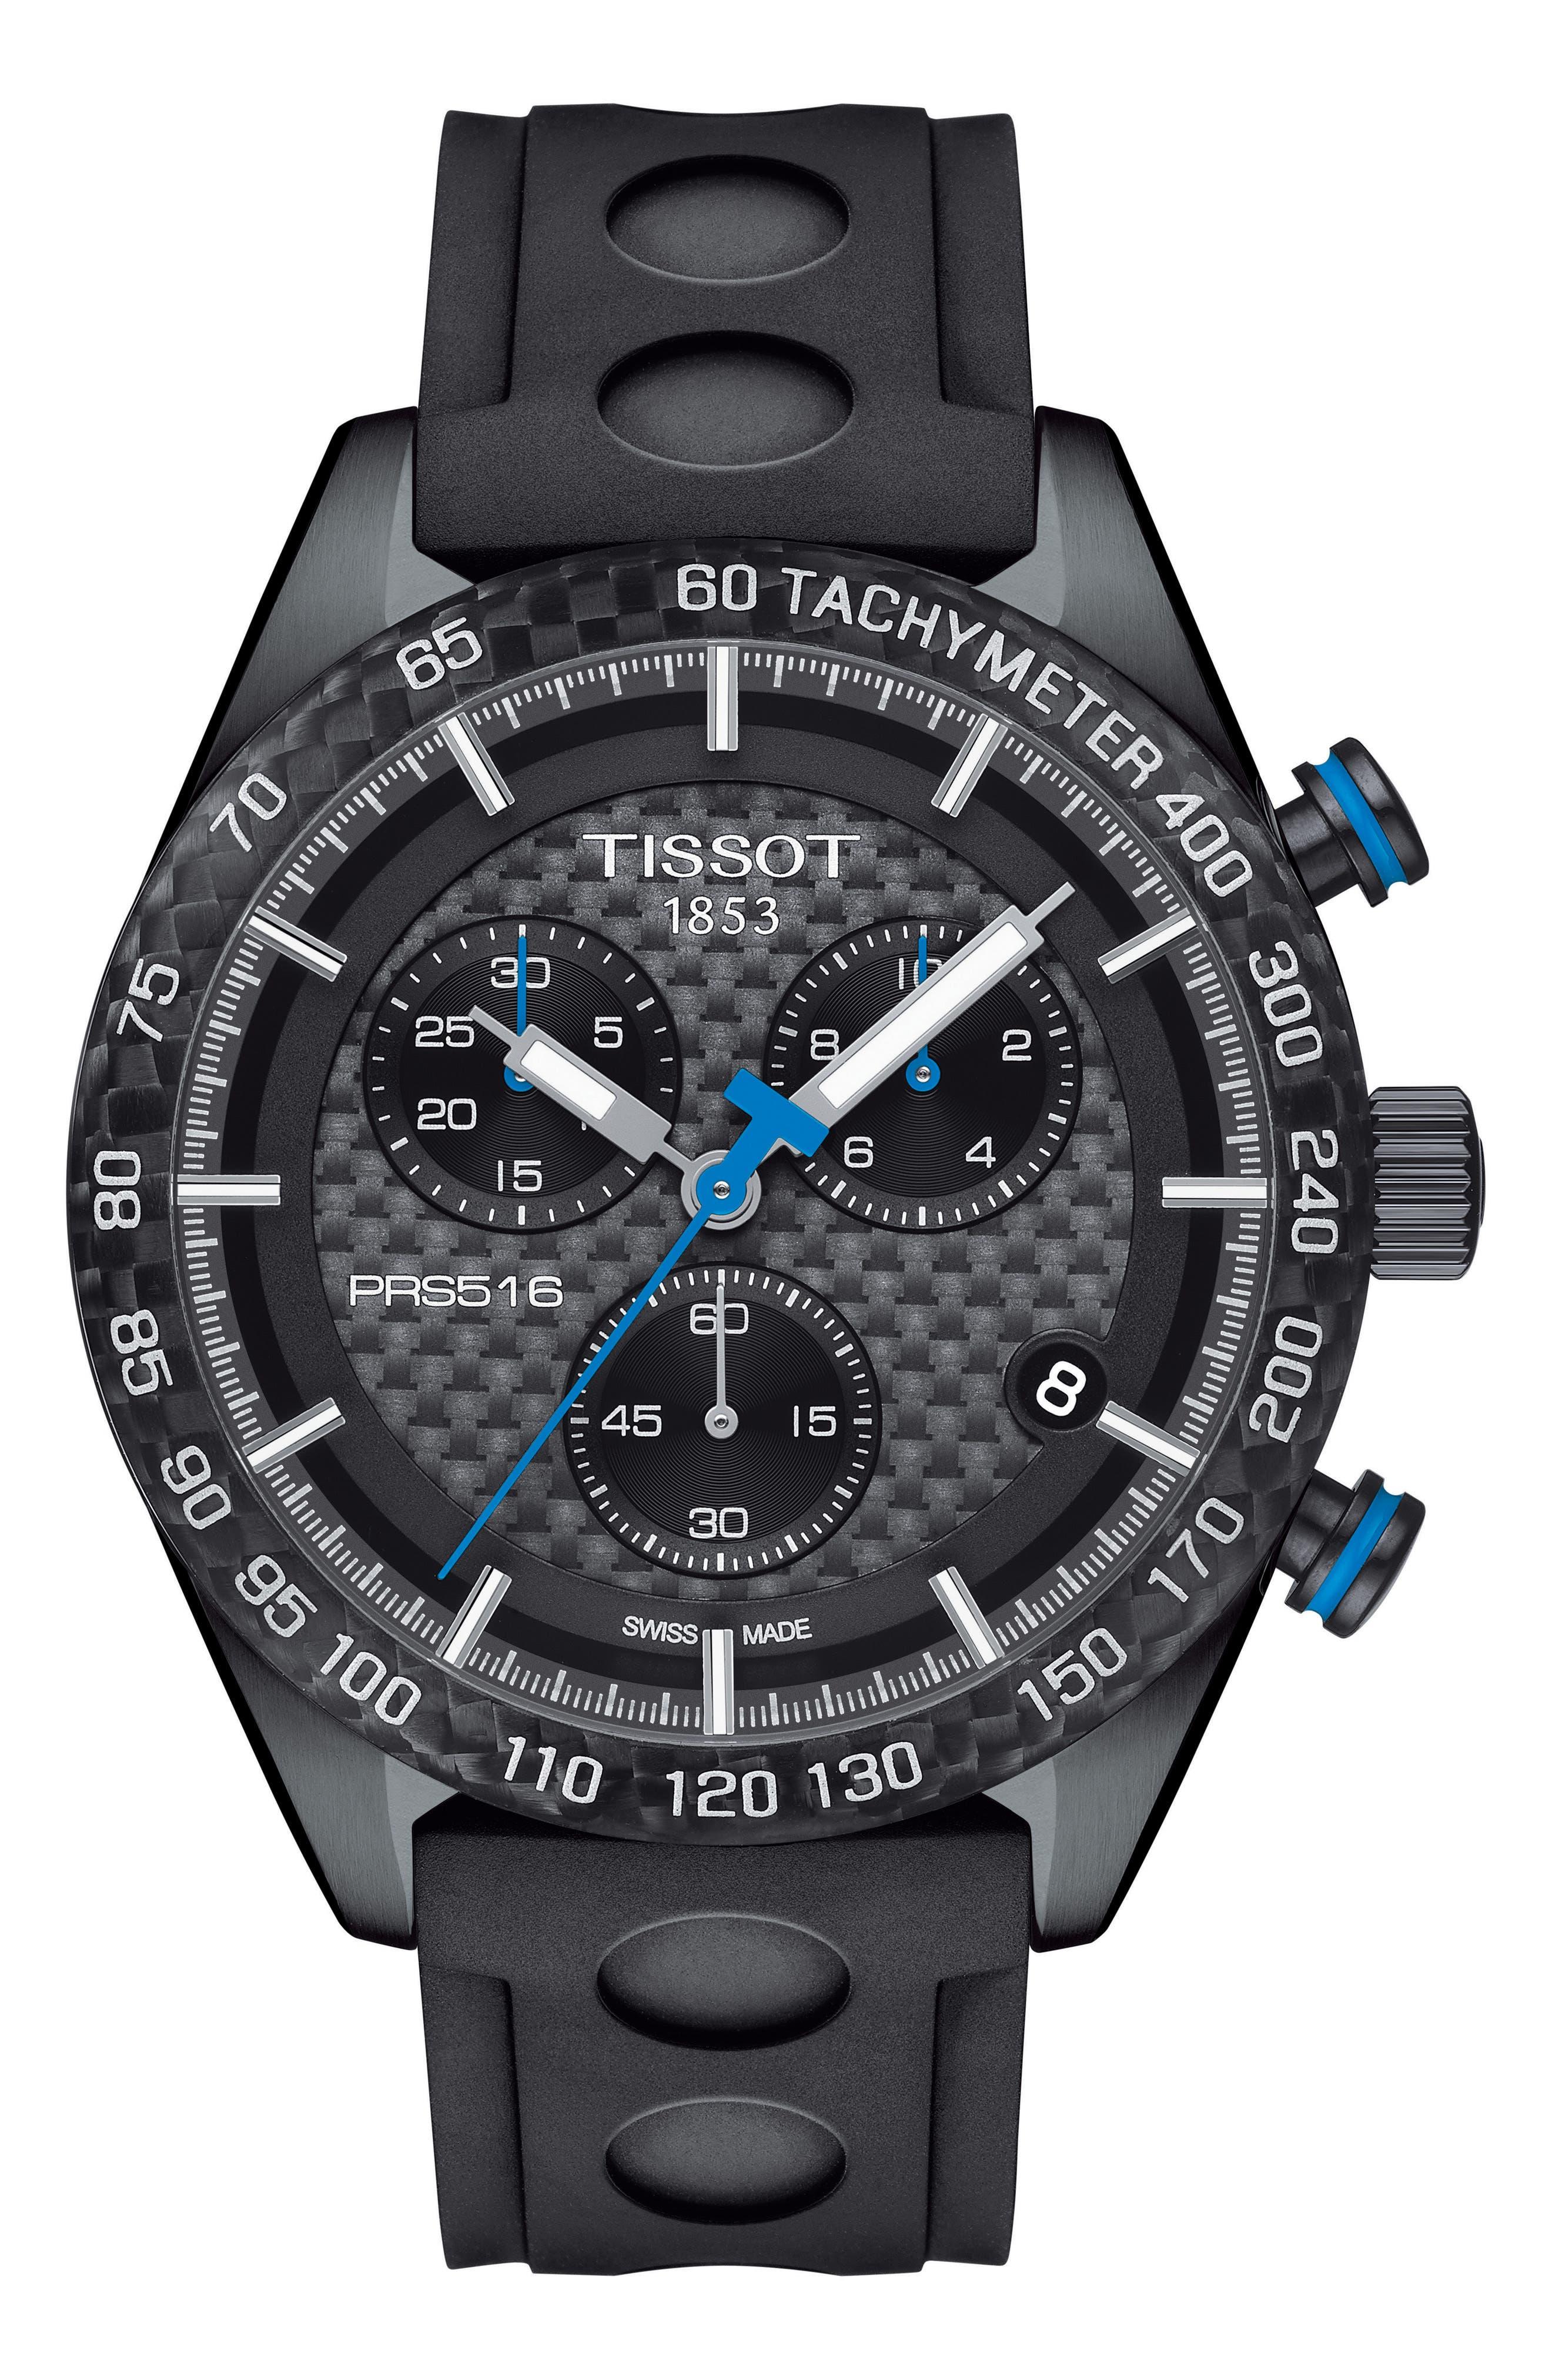 Tissot PRS516 Chronograph Rubber Strap Watch, 42mm